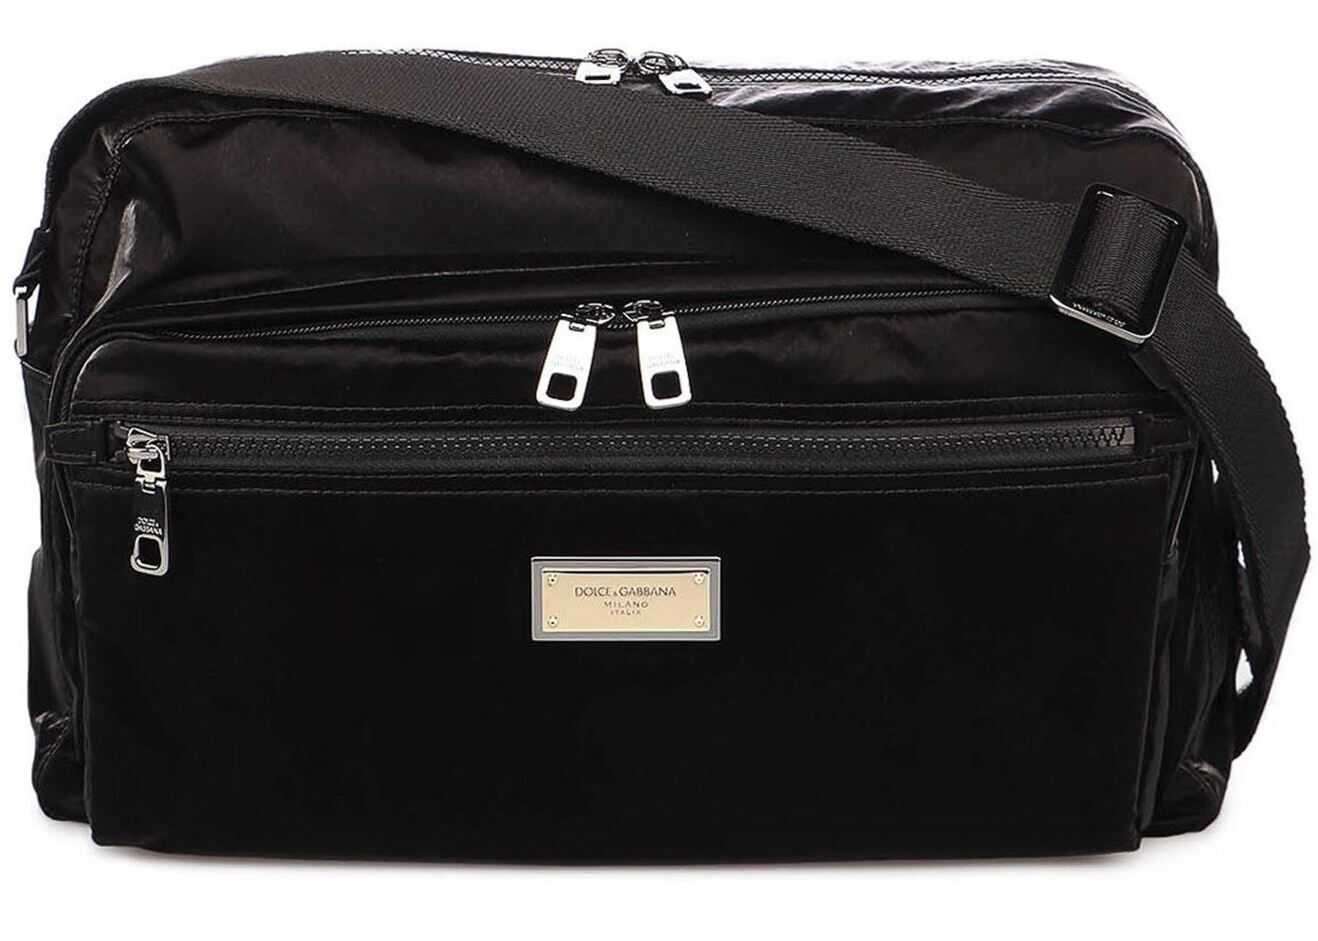 Dolce & Gabbana Messenger Bag Sicilia In Black BM1955AO24380999 Black imagine b-mall.ro